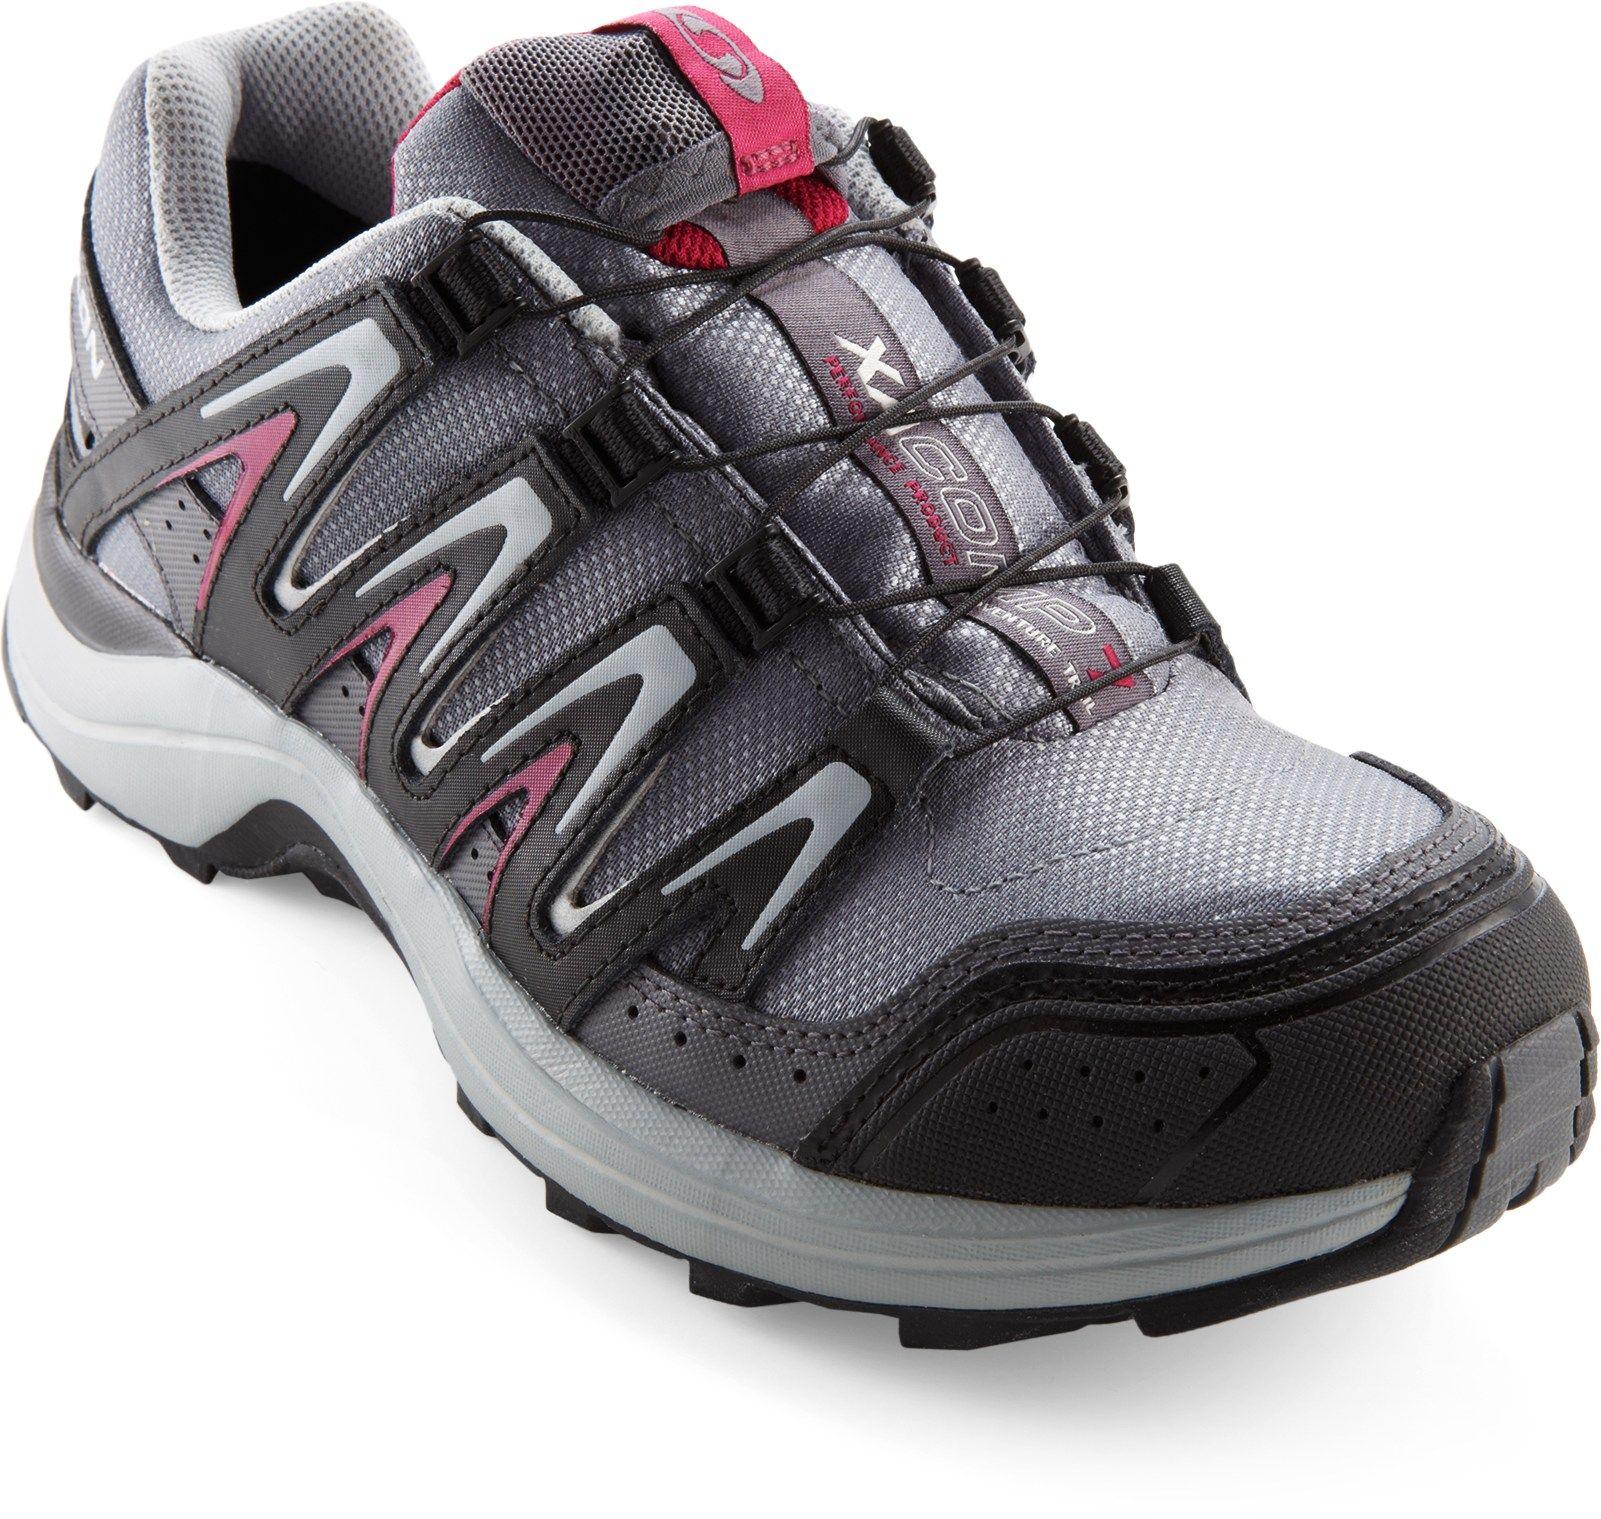 3ee9630f3f3c Salomon XA COMP 7 CS WP Trail-Running Shoes. NO break in time